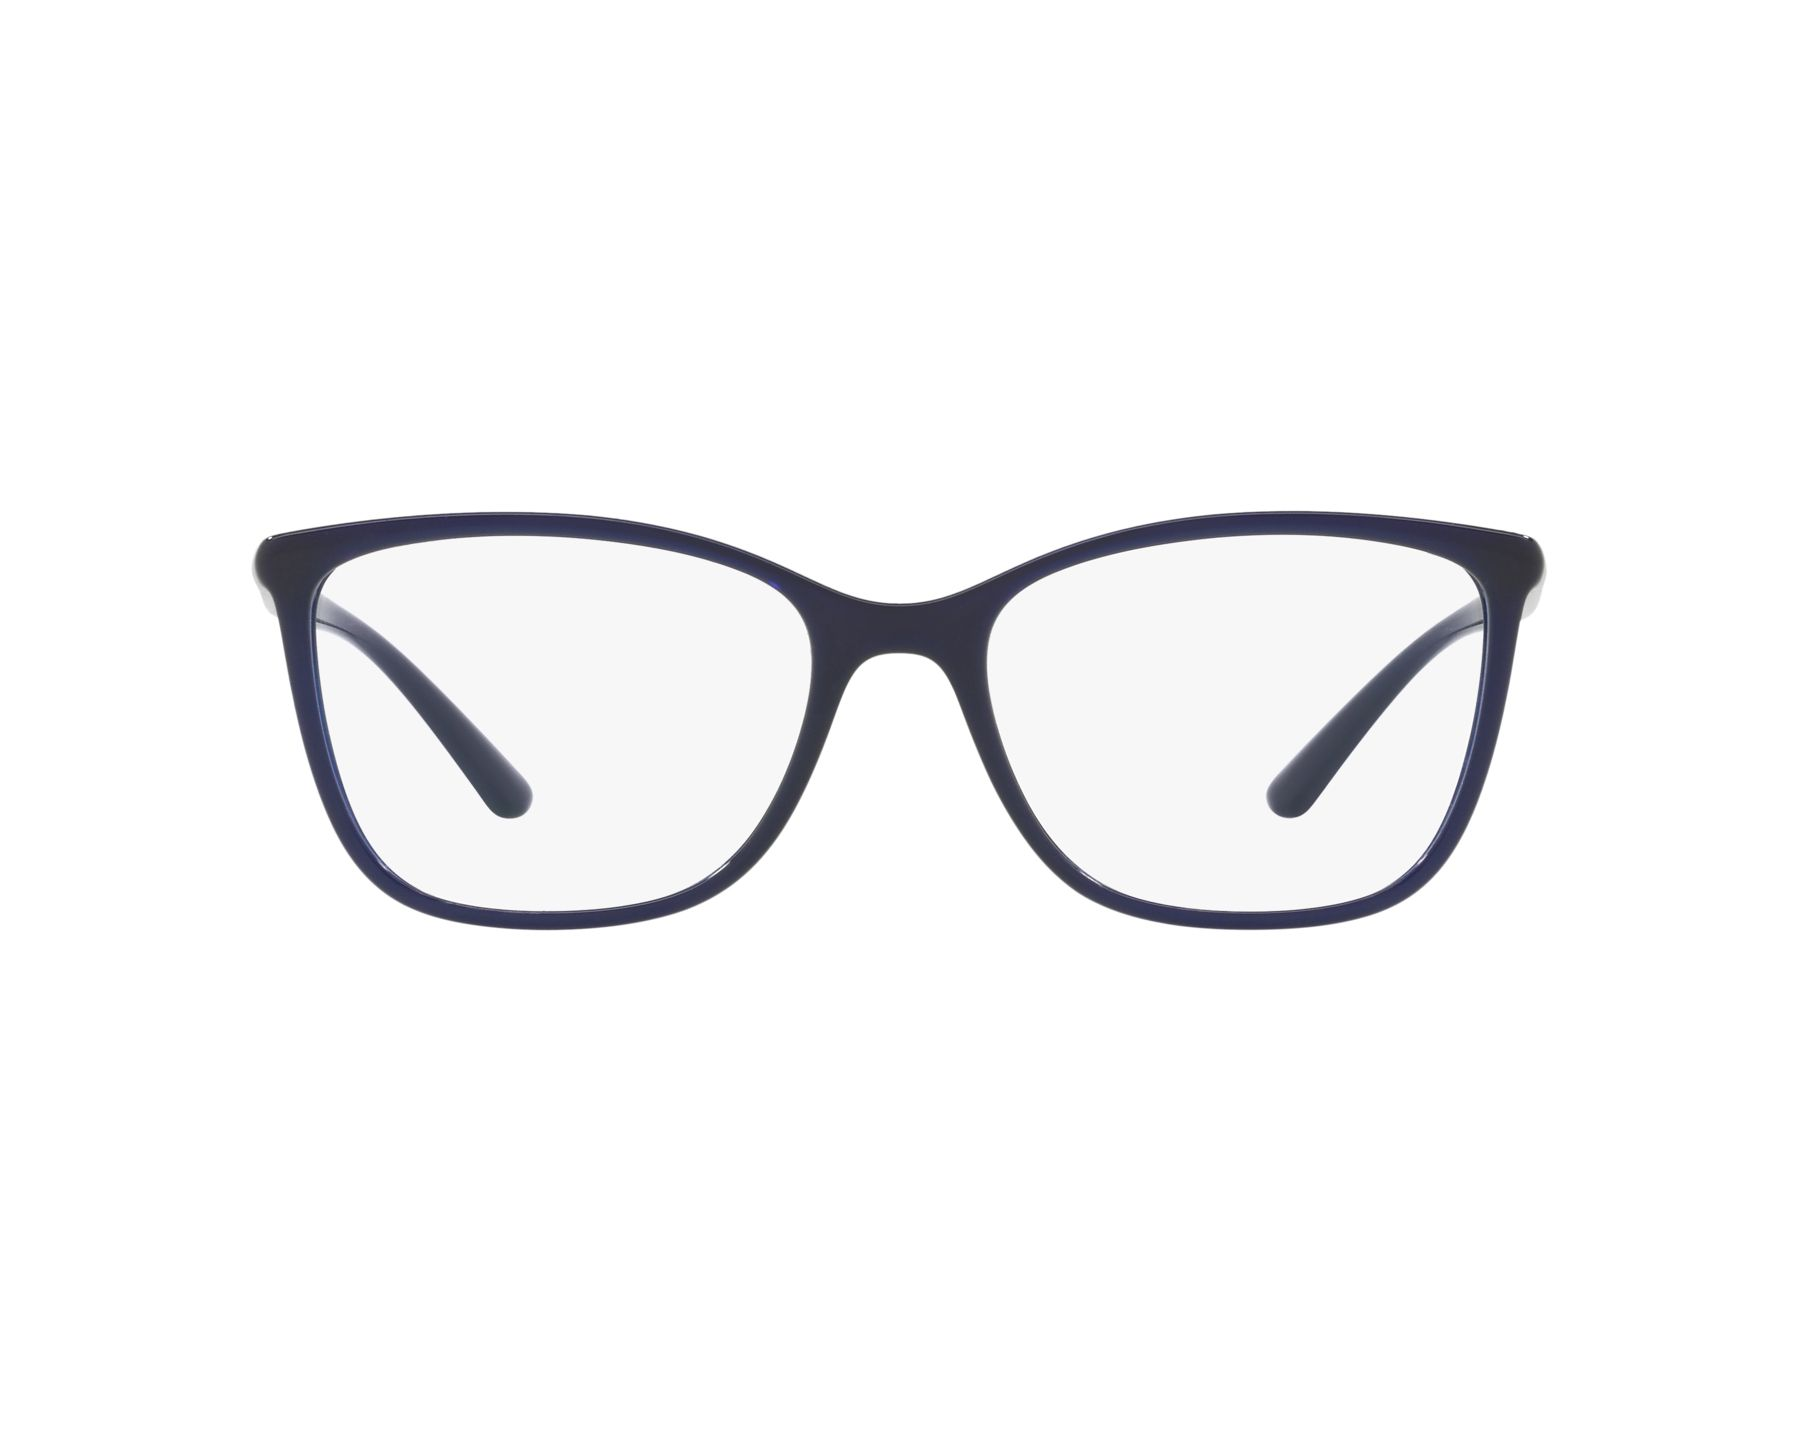 bf416ee9cde eyeglasses Dolce   Gabbana DG-5026 3094 54-17 Blue 360 degree view 1